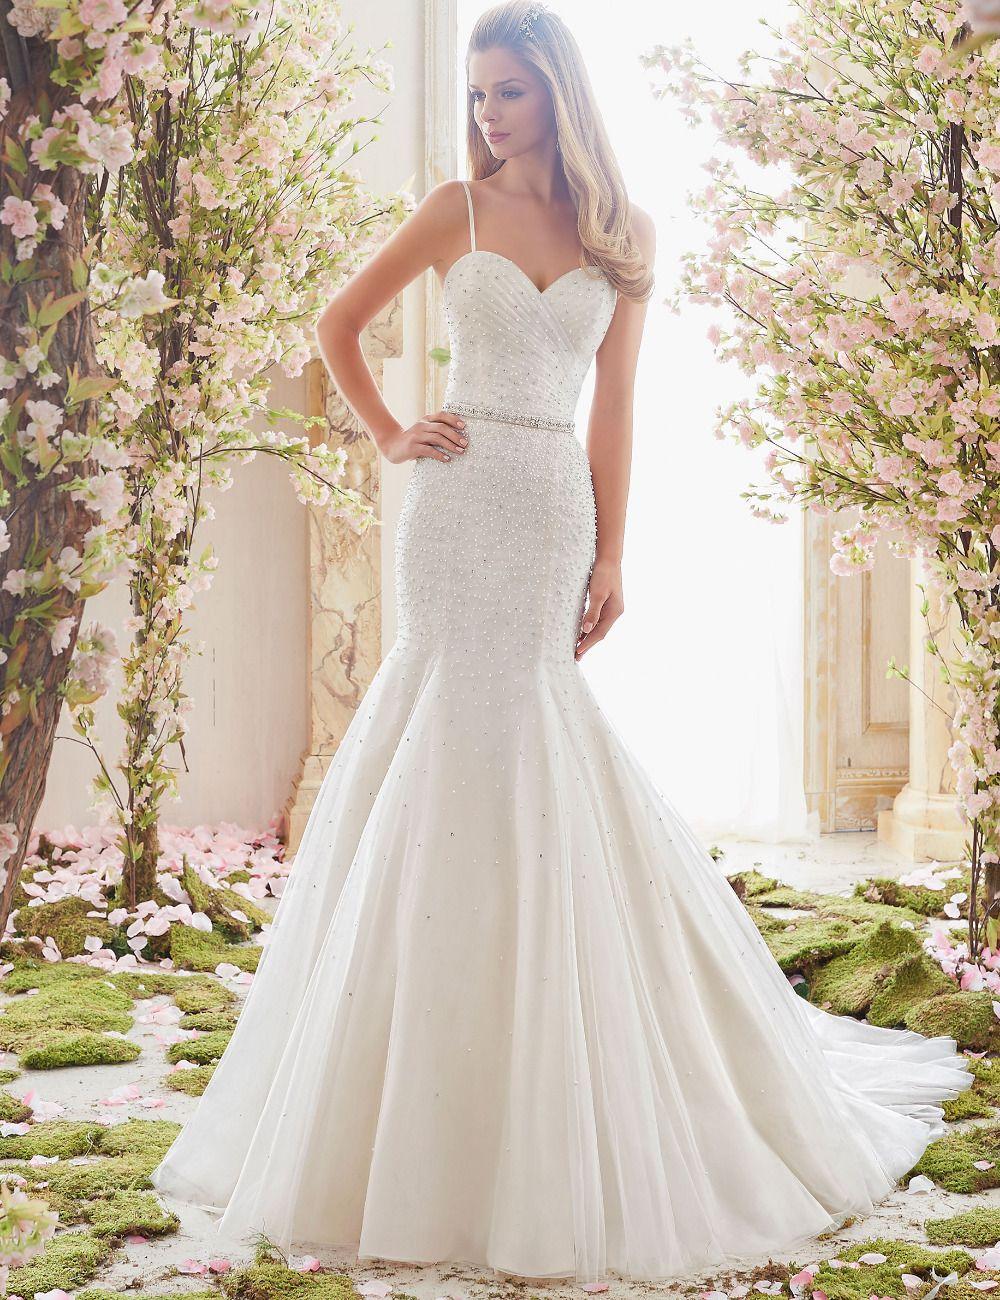 Free Shipping] Buy Best Vestidos De Noiva De Luxo Bridal Gown ...